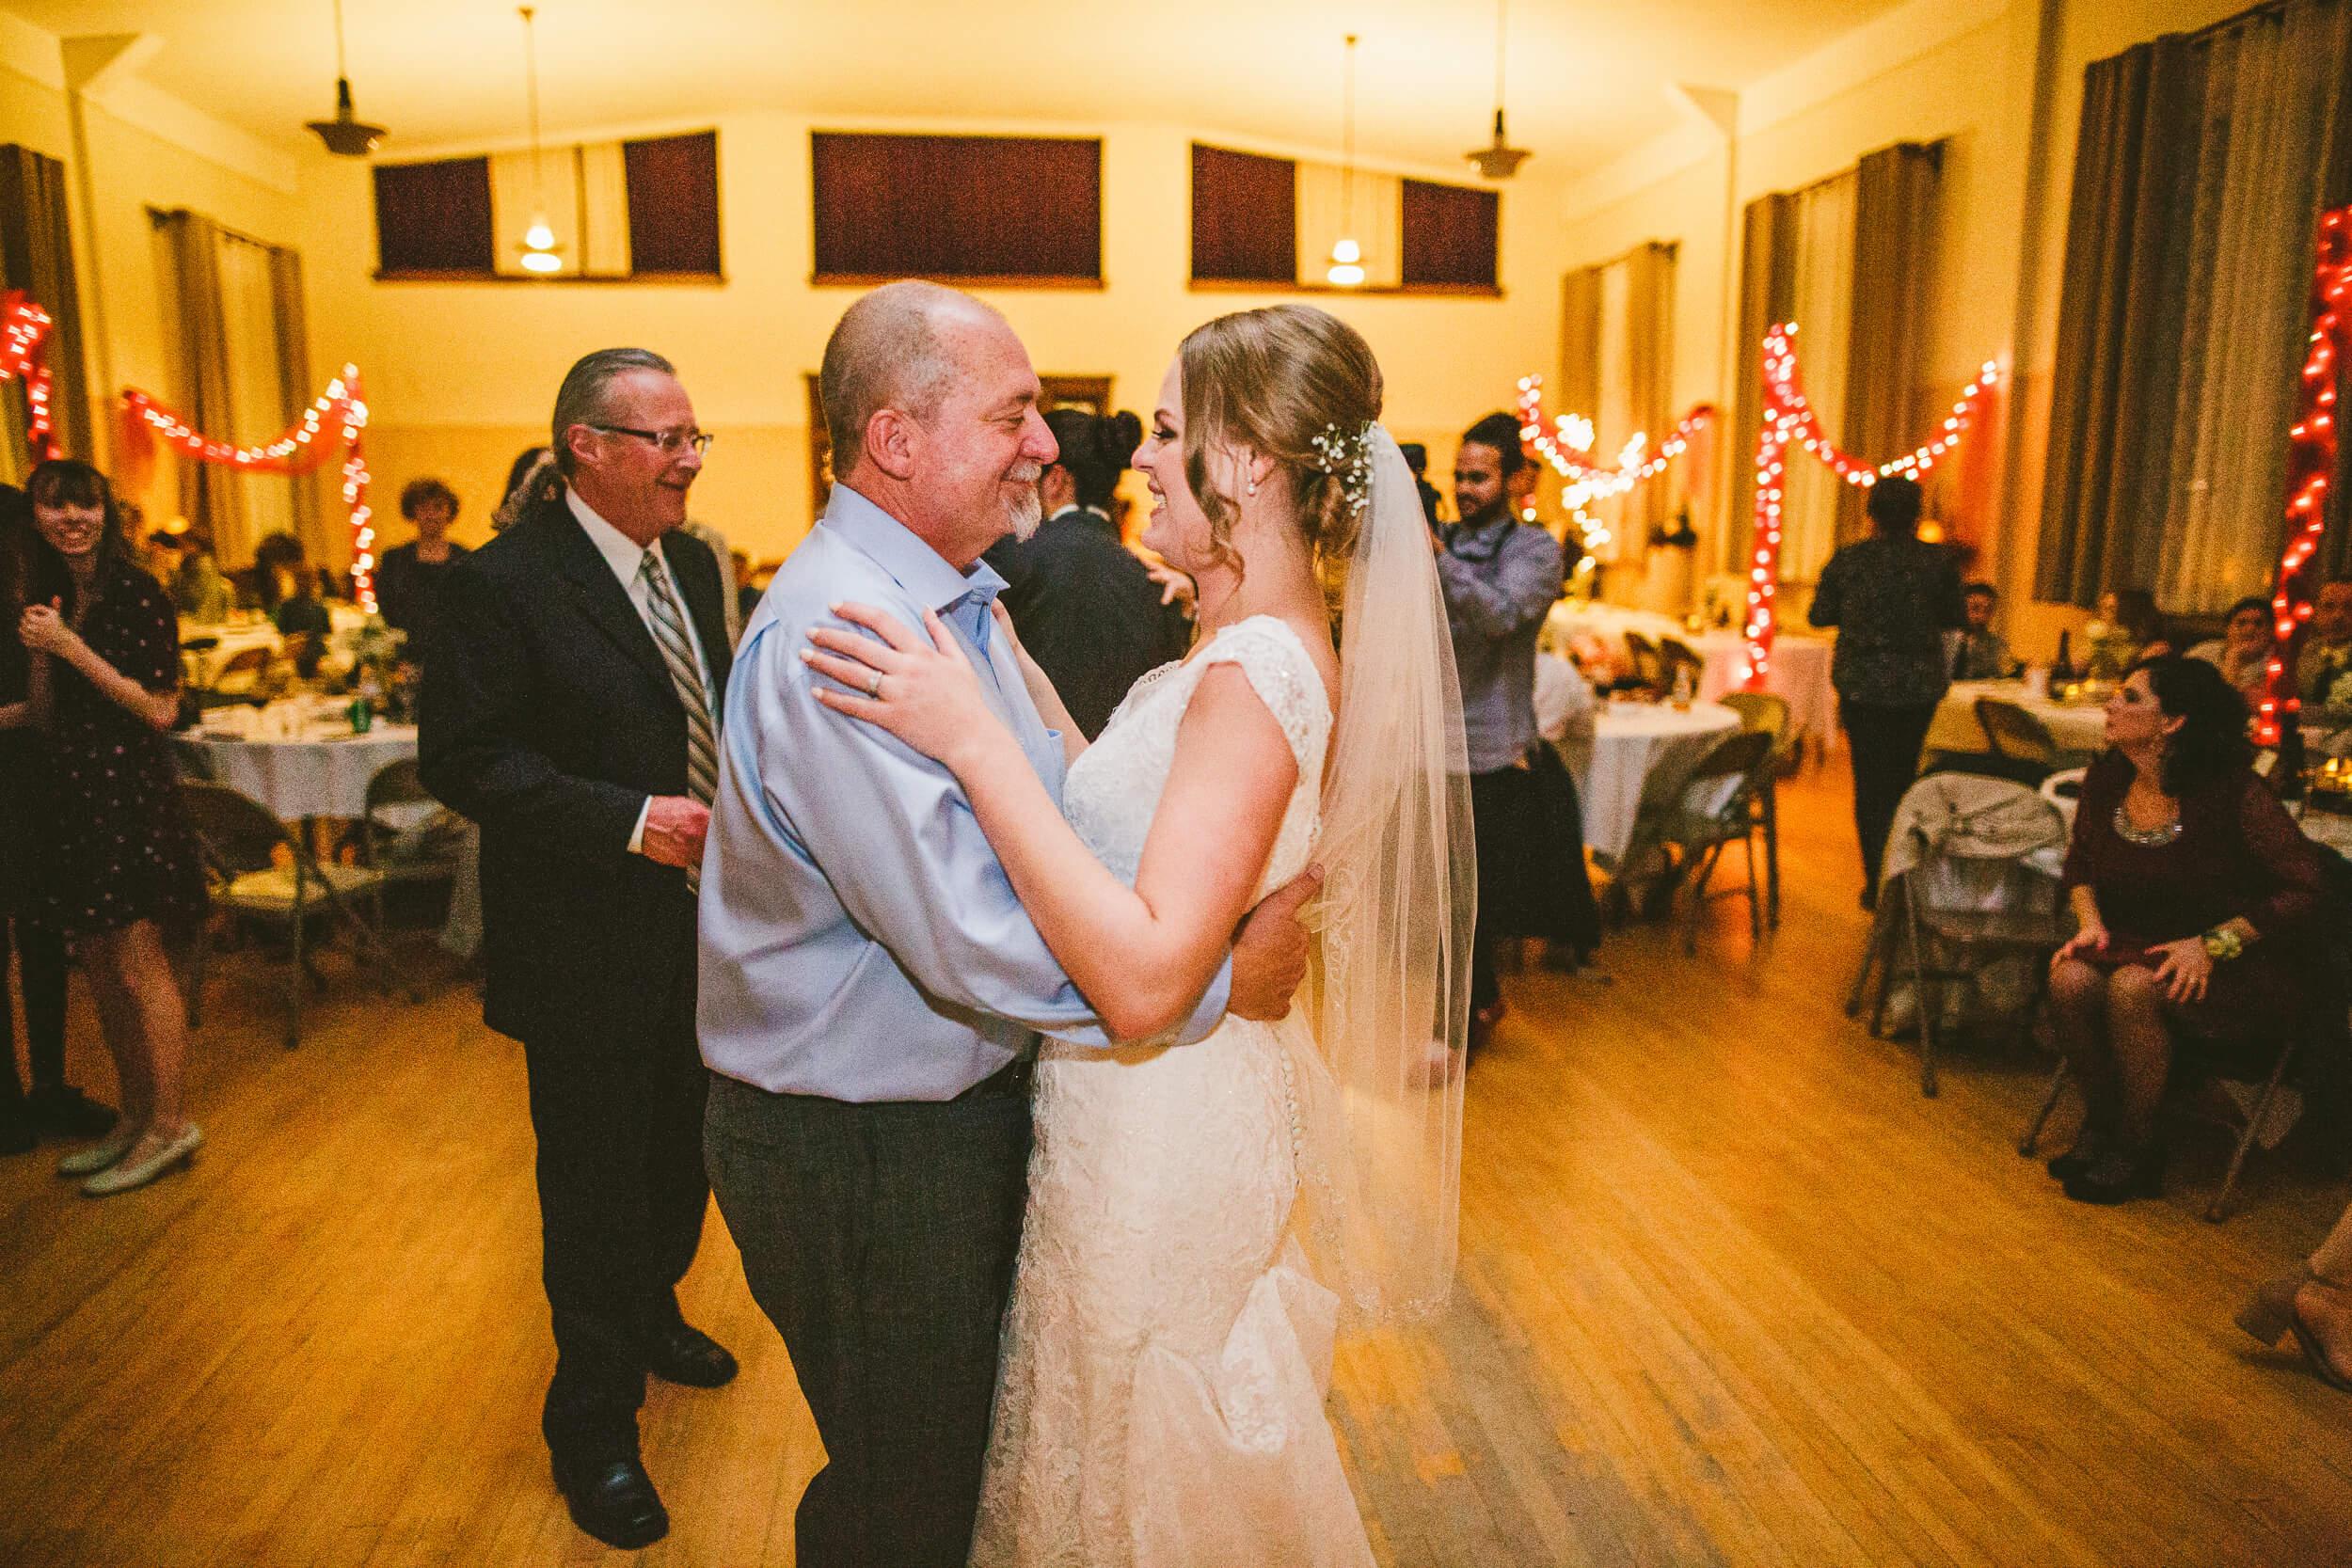 mukogawa winter wedding in spokane (331).jpg